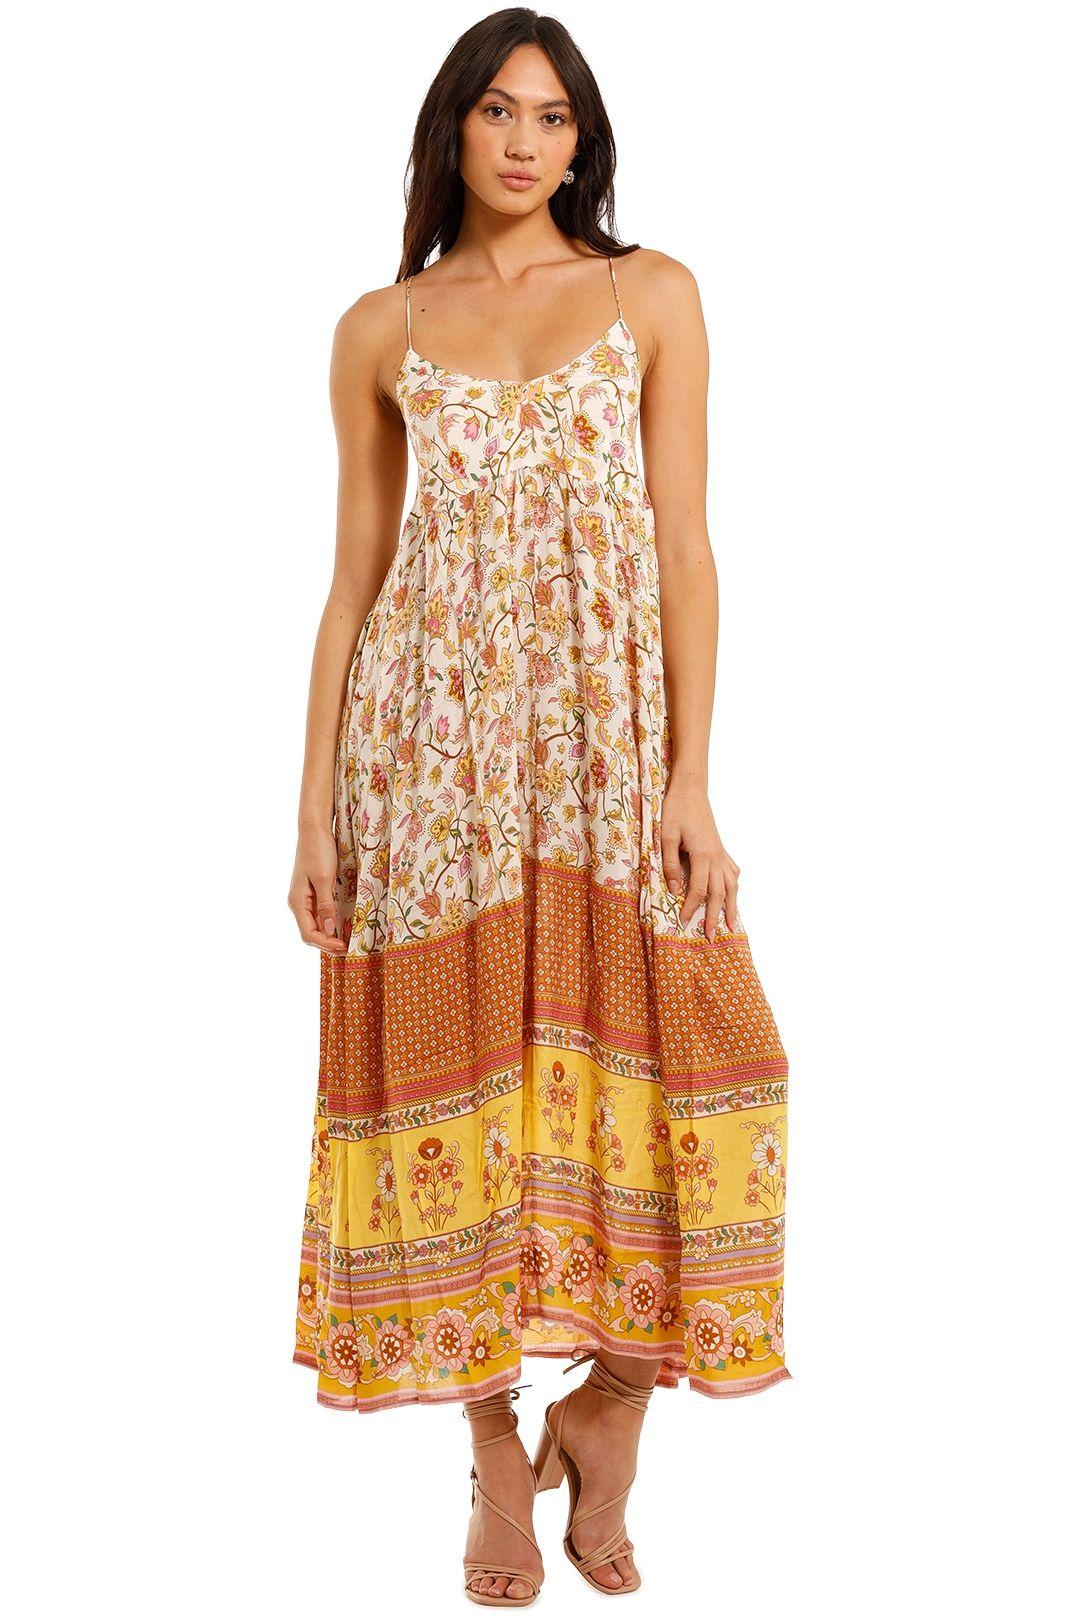 Spell Portobello Road Maxi Dress Honeydew